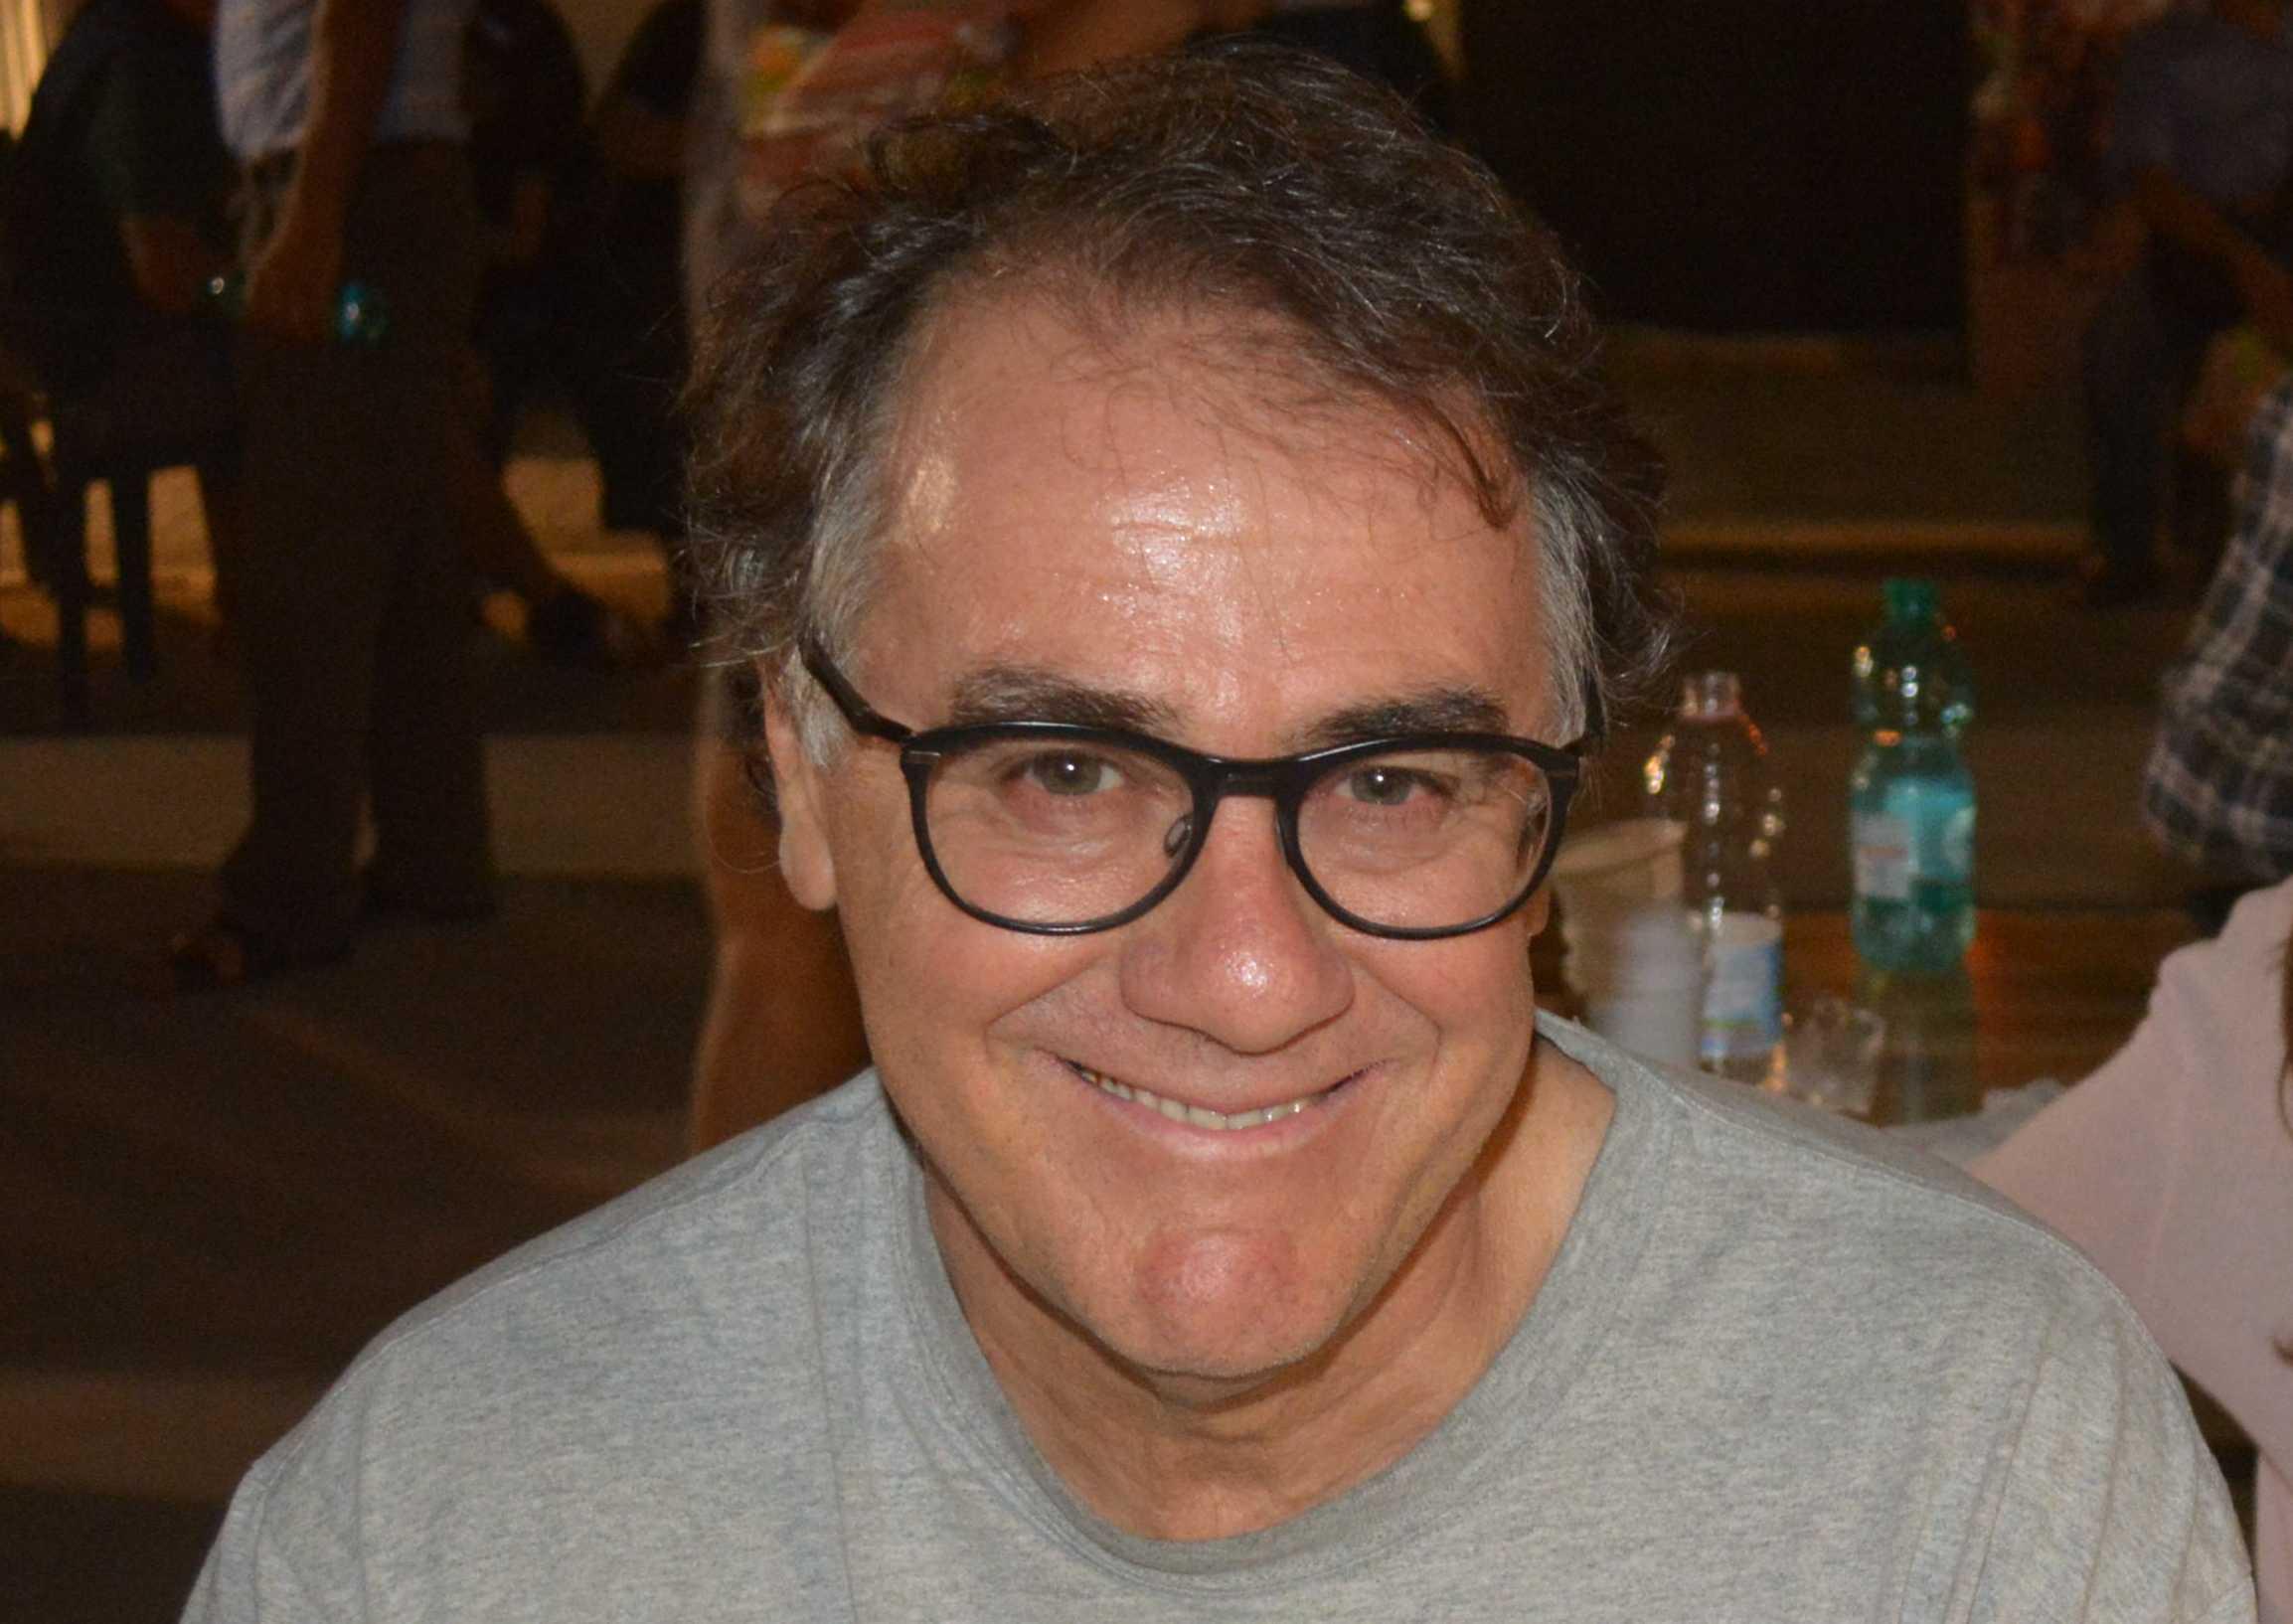 Giulio Mancini